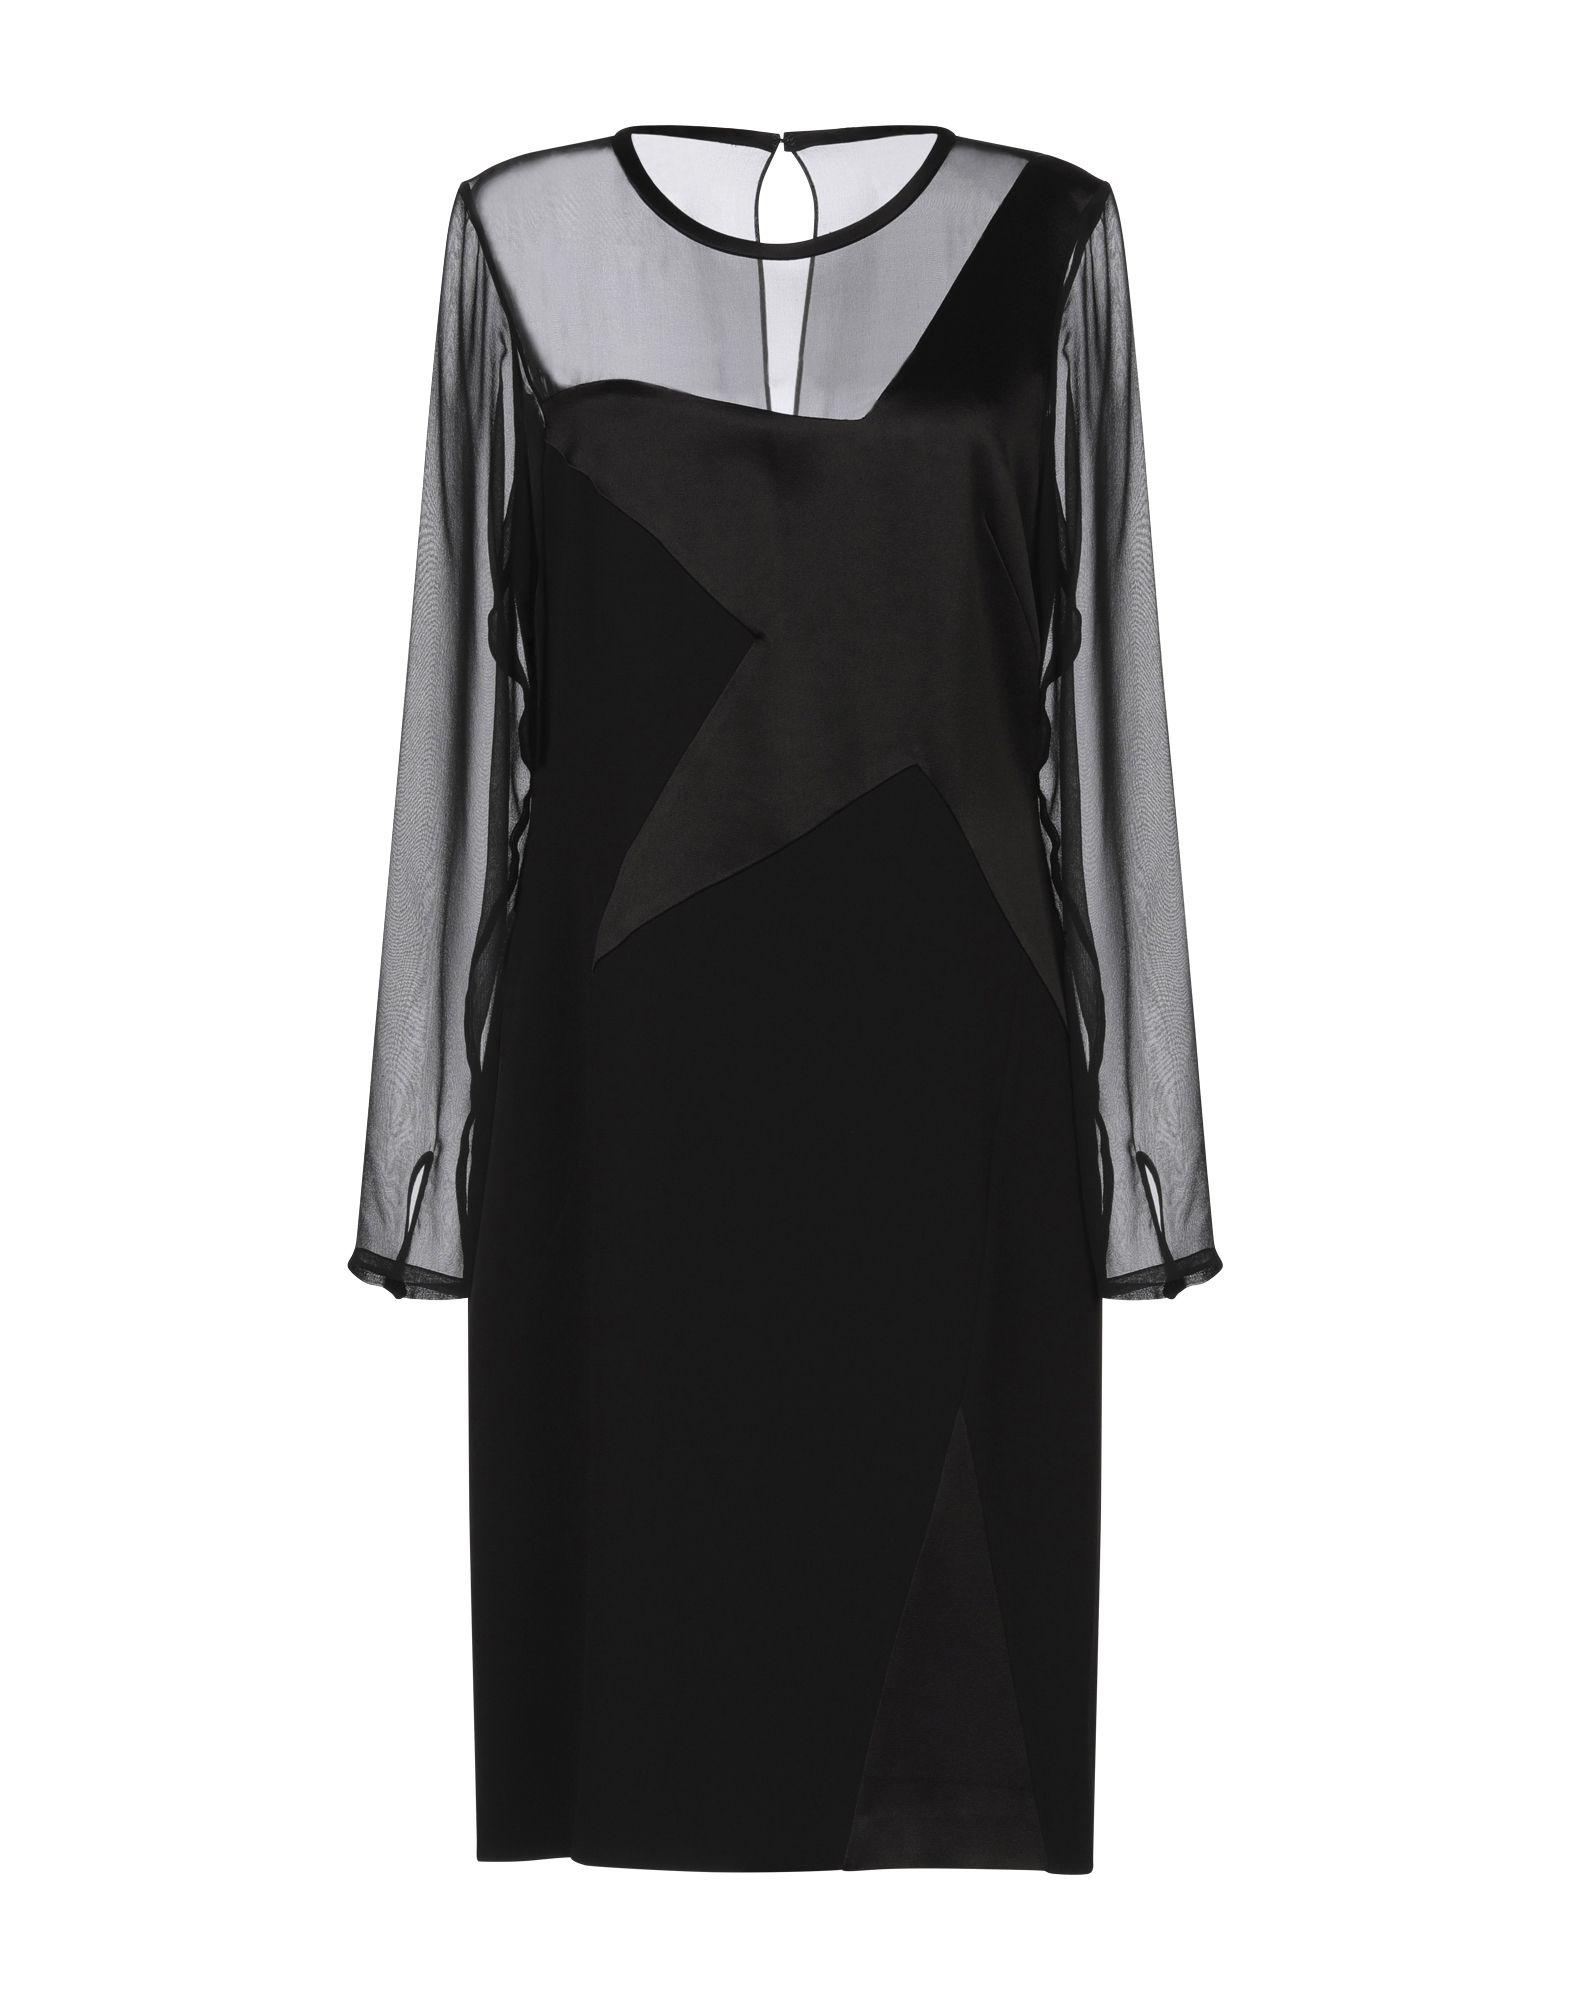 Vestito Al Ginoc o Karl Karl Lagerfeld donna - 34954816XM  ausgezeichnete preise